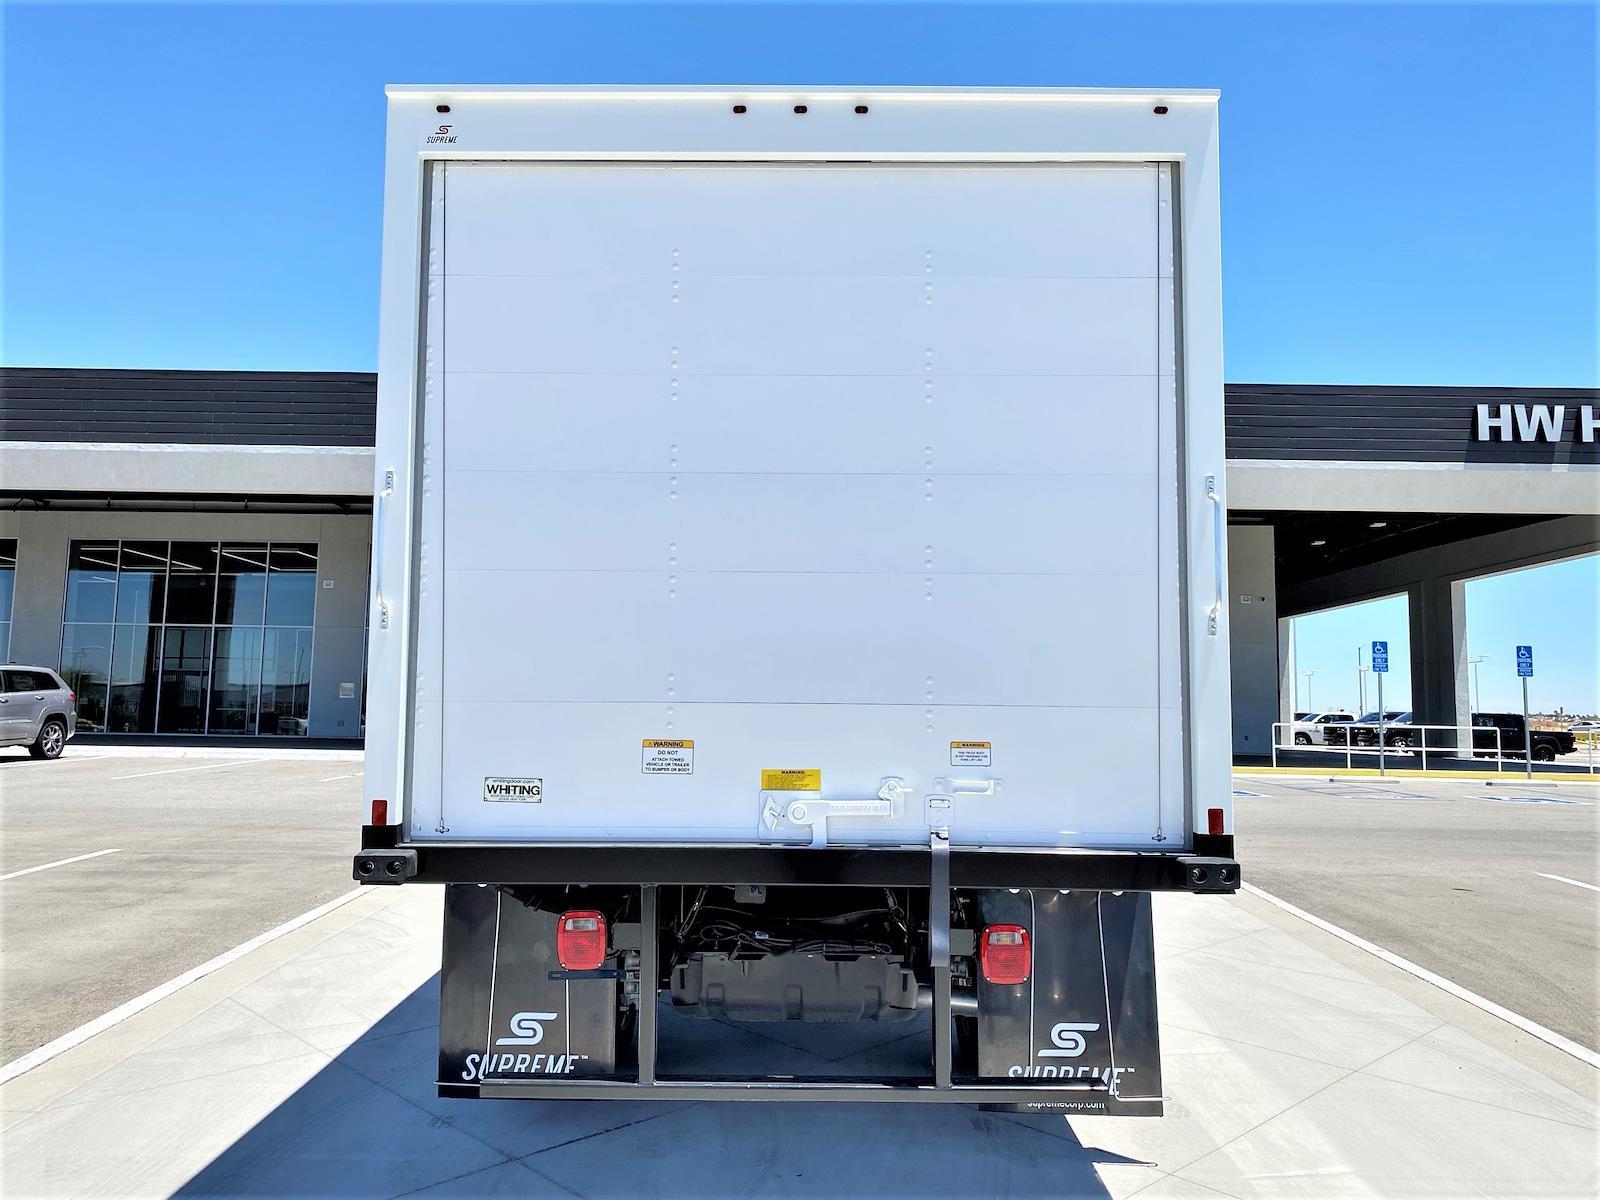 2020 Ram 5500 Regular Cab DRW 4x2, Supreme Iner-City Dry Freight #XCC53640 - photo 8